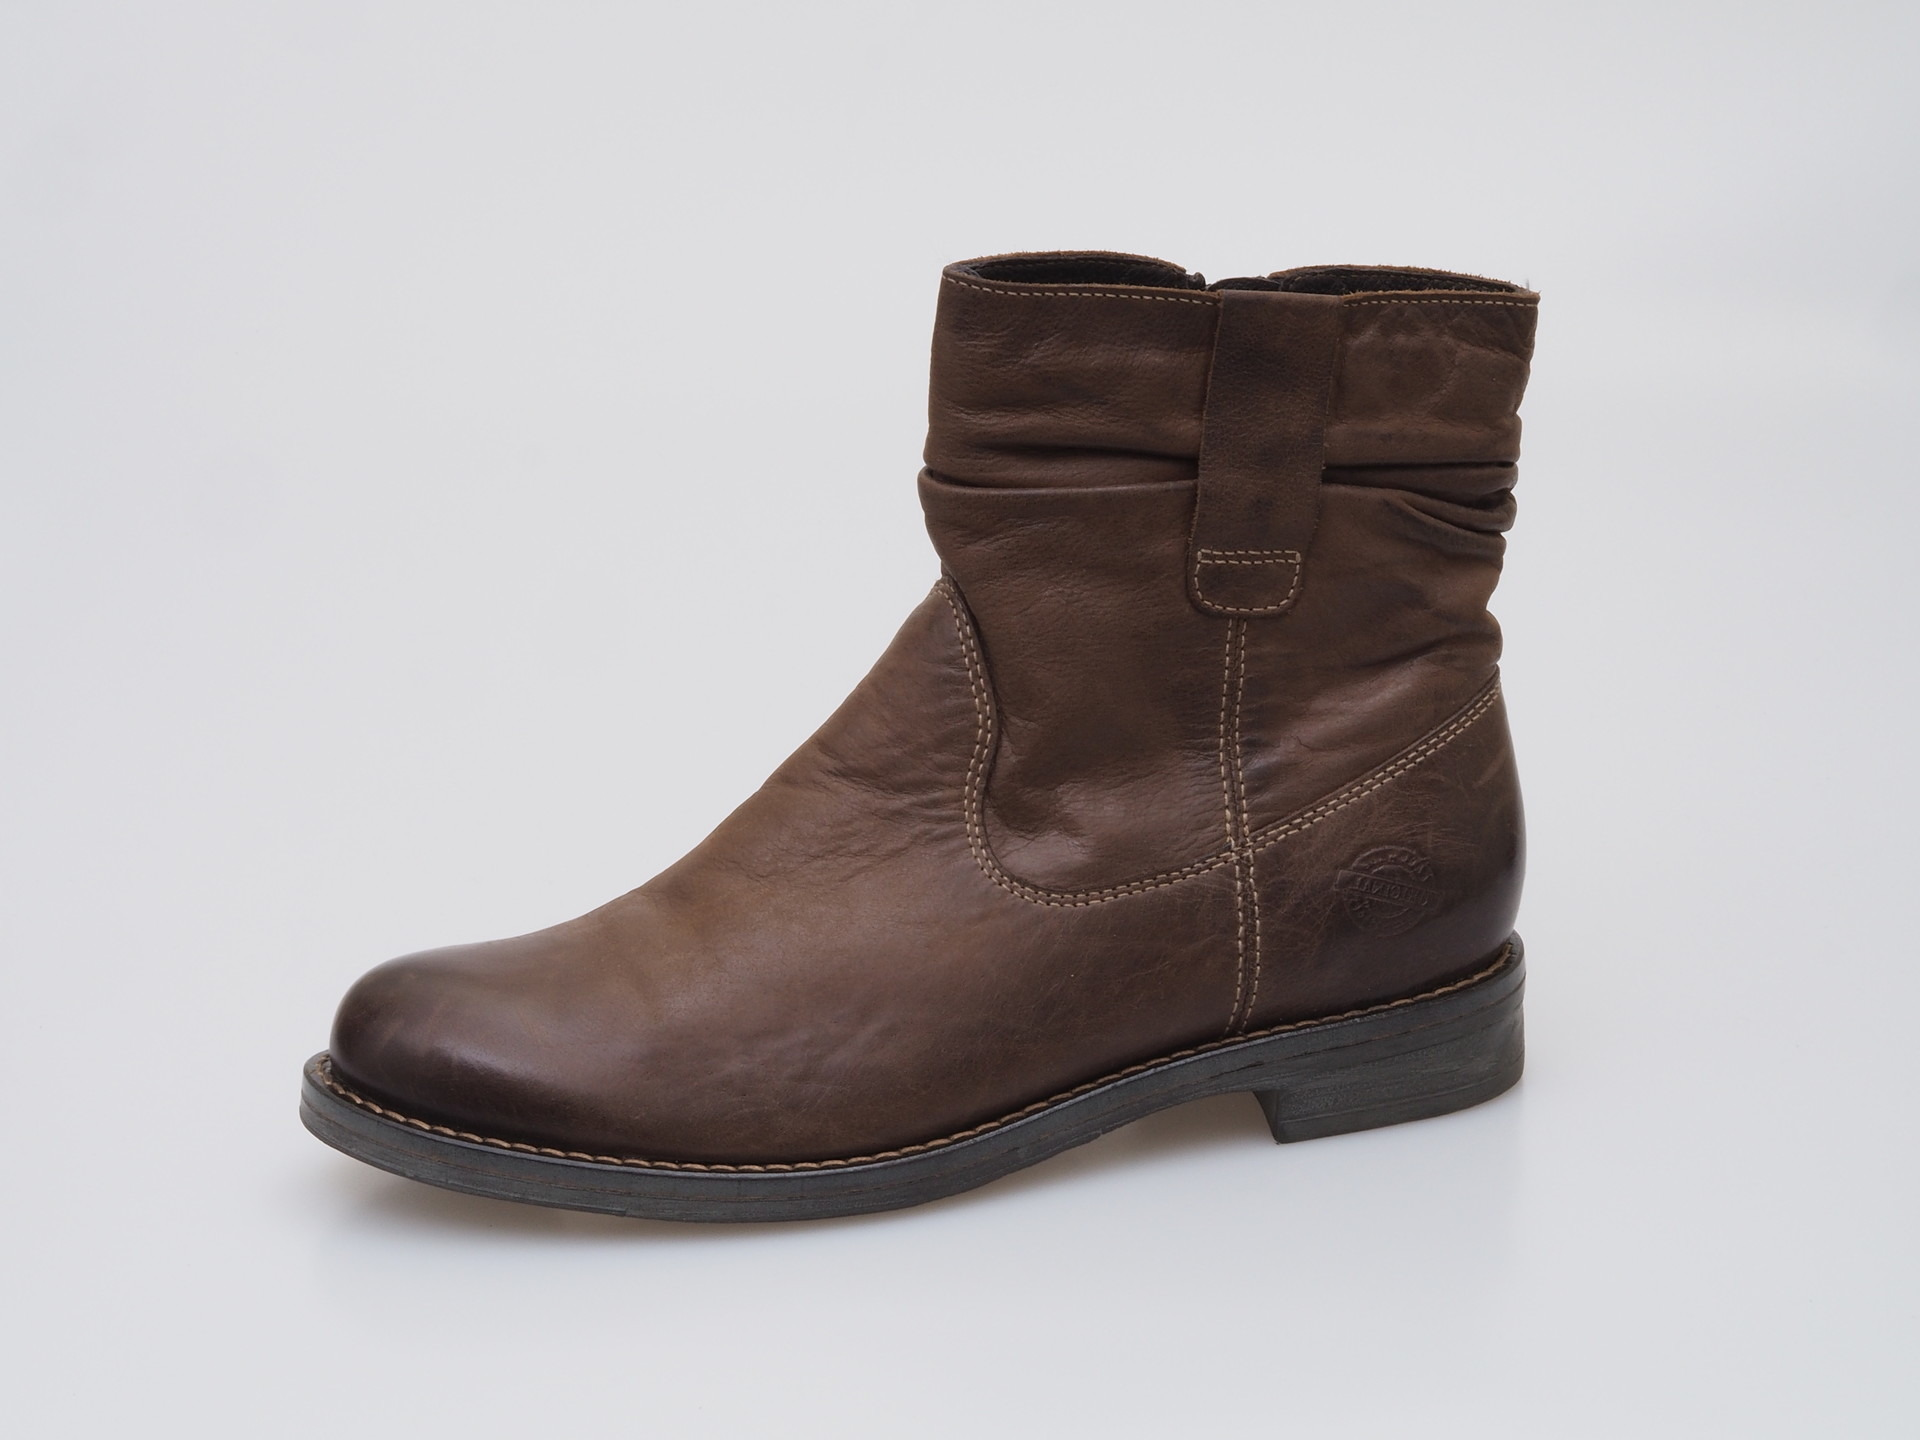 2e06e1e43 Hnedá dámska členková obuv zateplená značky Klondike